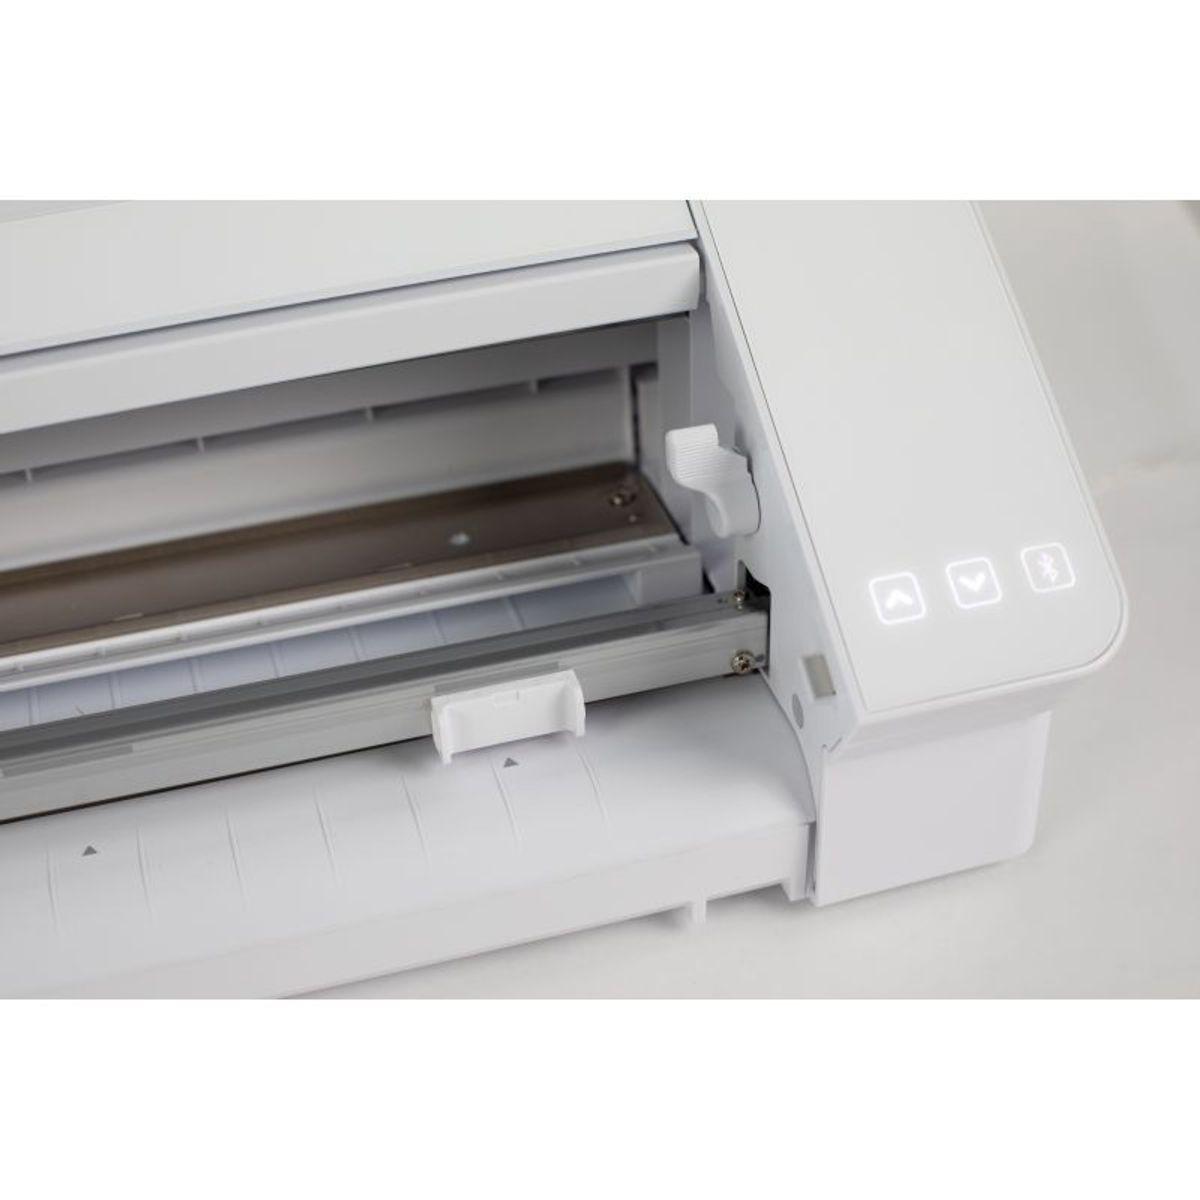 Machine de découpe Silhouette Cameo 4 Pro